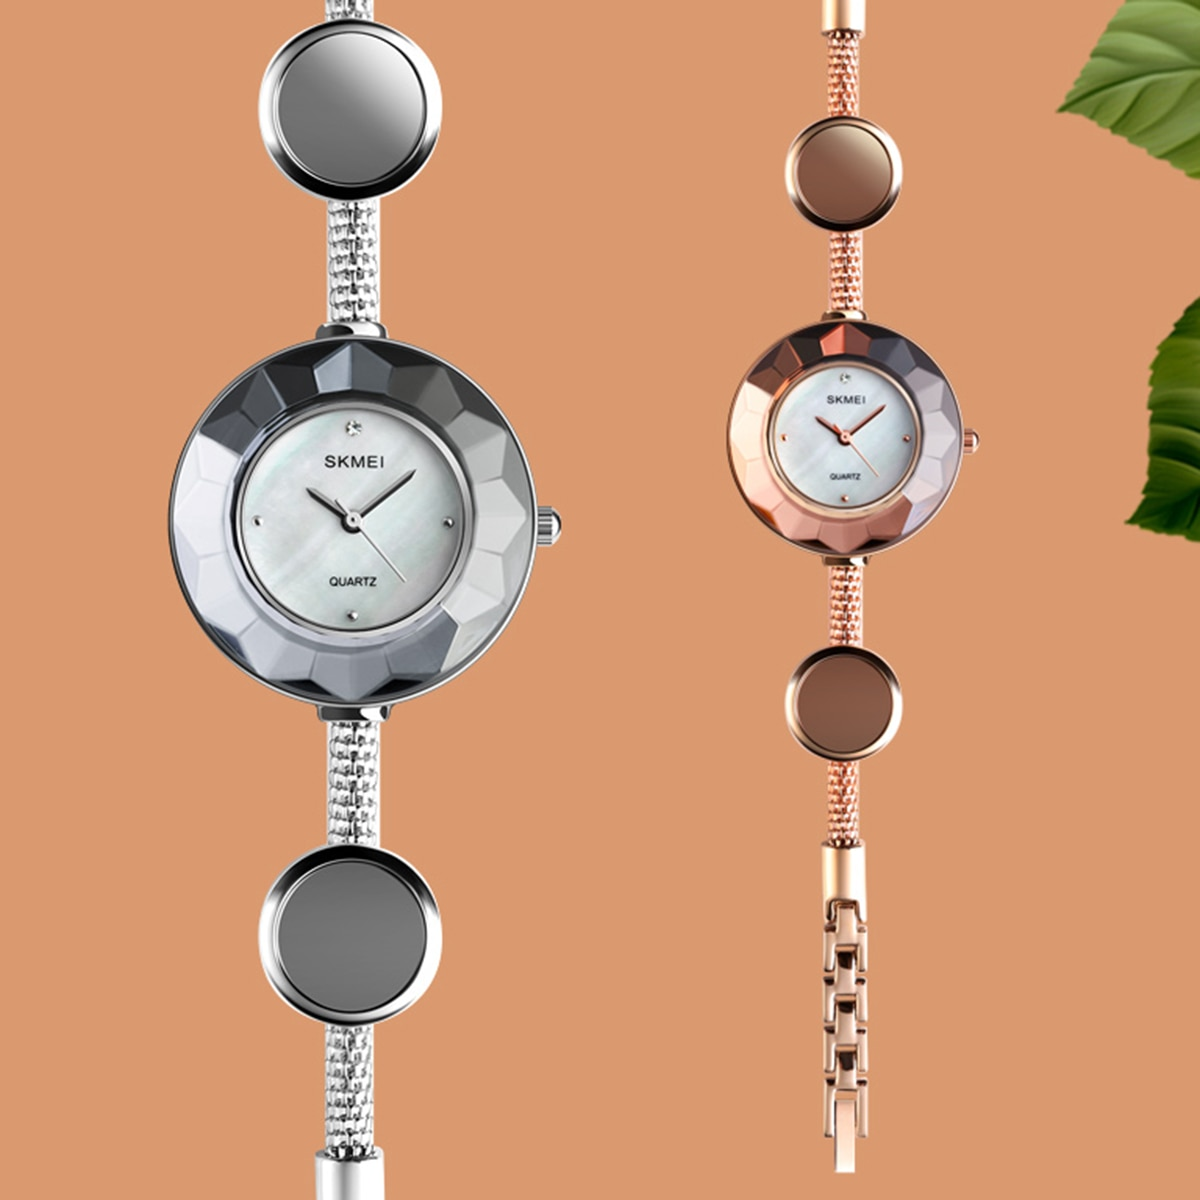 New Women Fashion Quartz Wrist Watch Waterproof Casual Simple Dress Watch with Bracelet Strap Ladies Wrist Watch